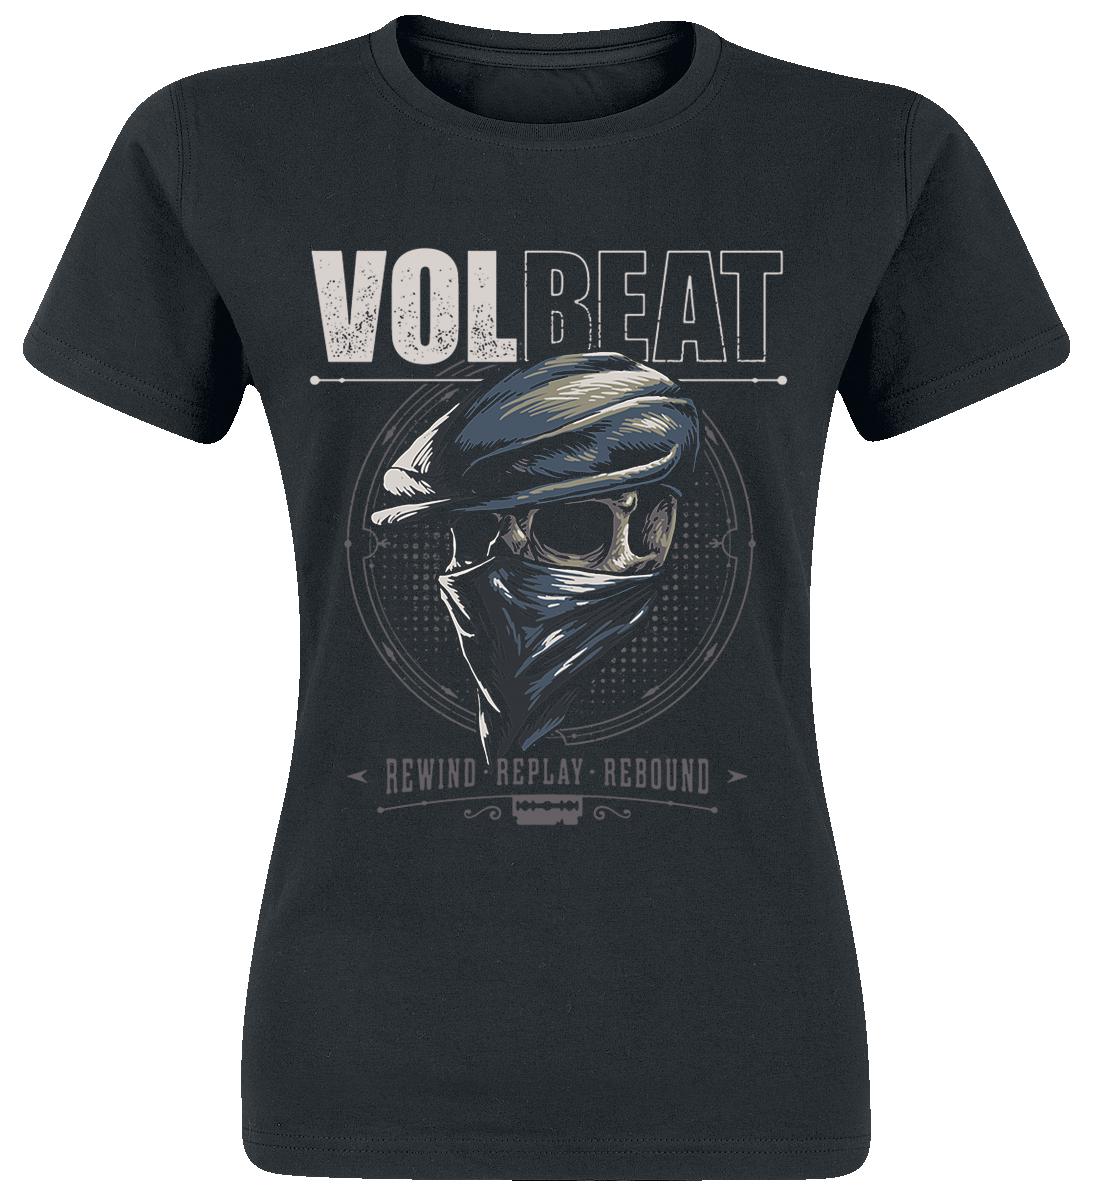 Volbeat - Bandana Skull - Girls shirt - black image